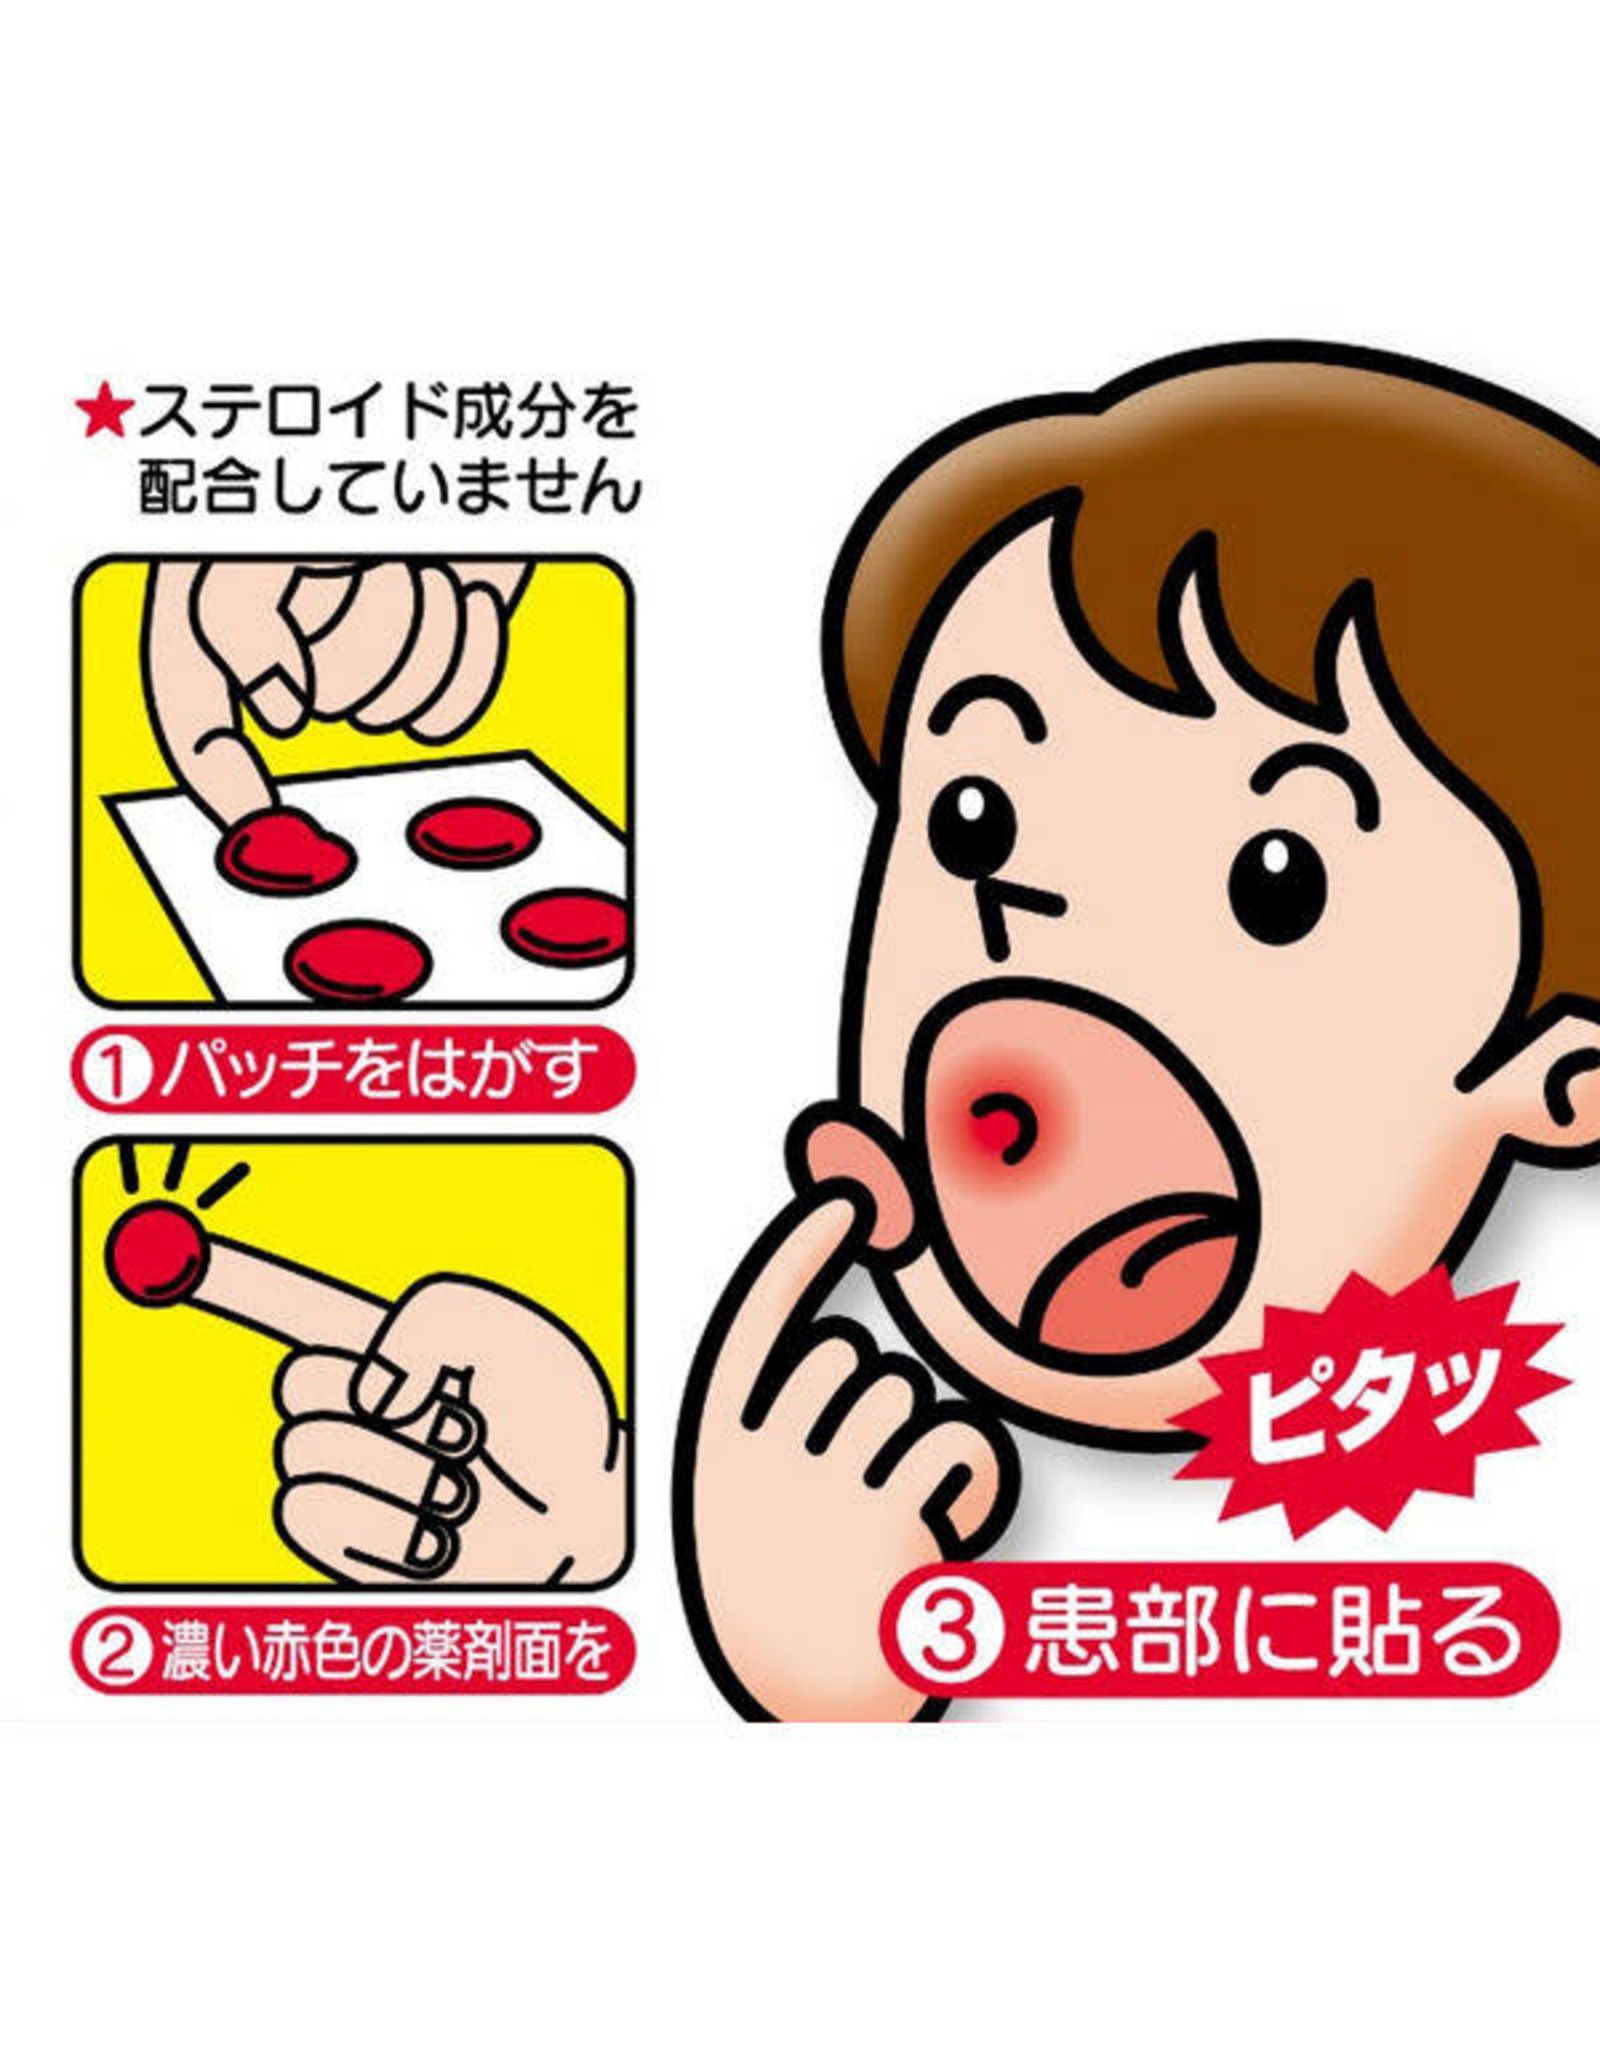 Taisho Taisho Stomatitis Patch 10 Patches